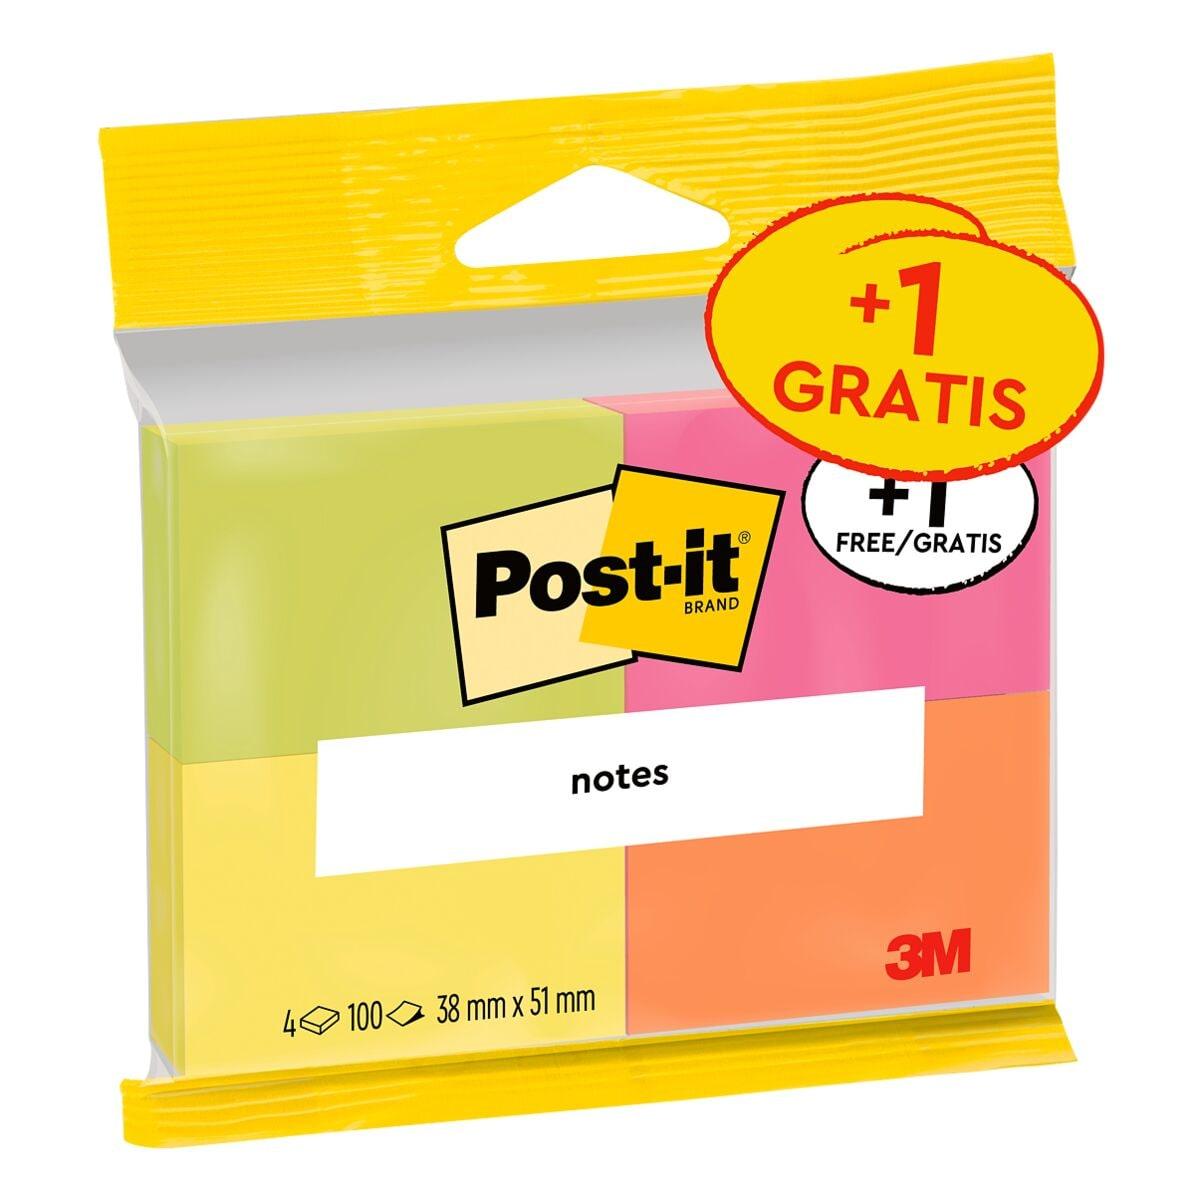 4x Post-it Notes Haftnotizblock Notes 653 5,1 x 3,8 cm, 400 Blatt gesamt, farbig sortiert